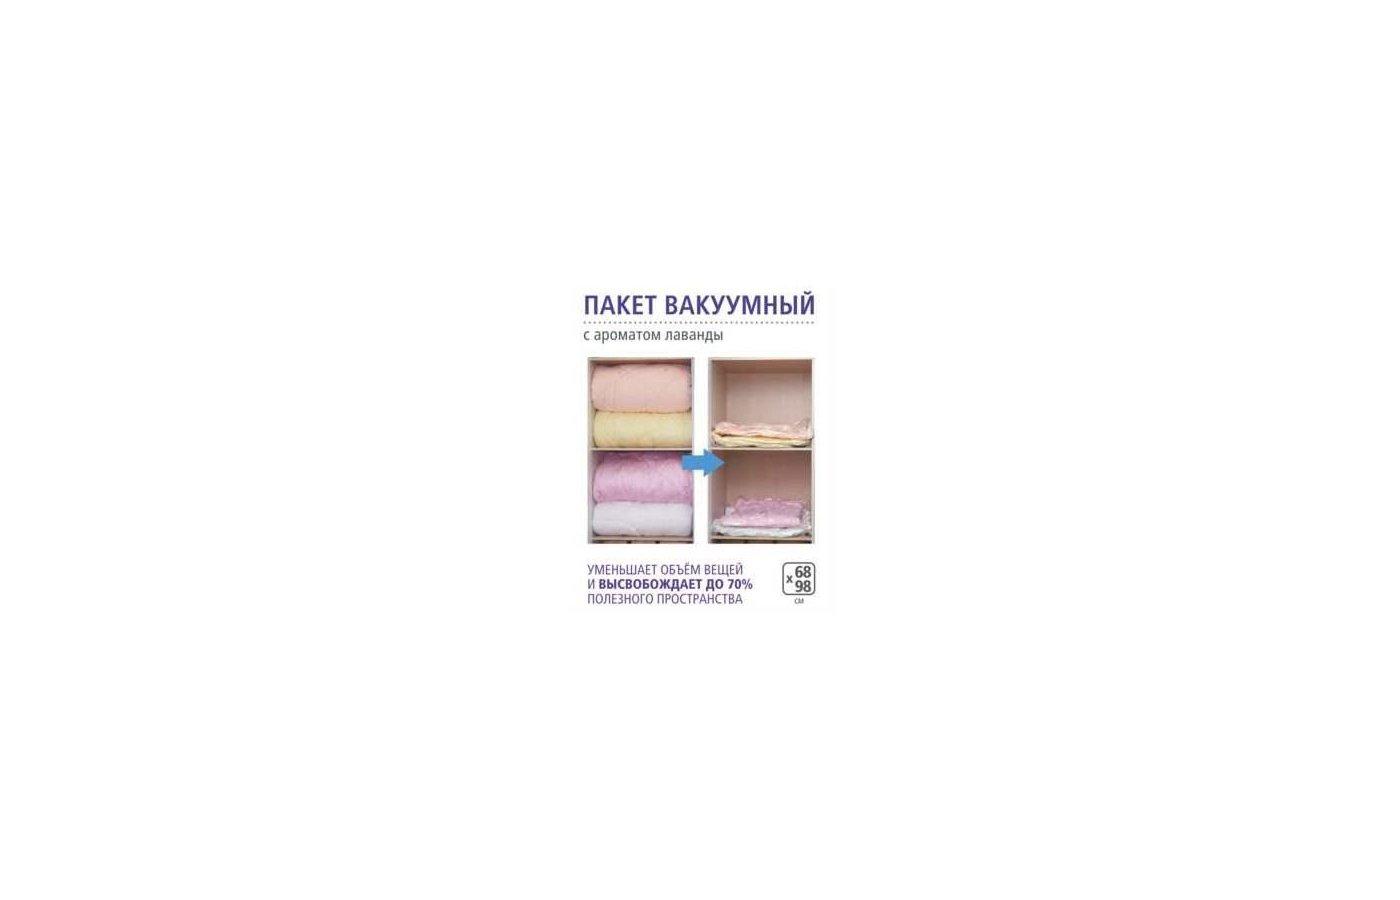 Емкости для хранения одежды VETTA 457-050 Пакет вакуумный 68х98см с ароматом лаванды арт. BL-6001-F